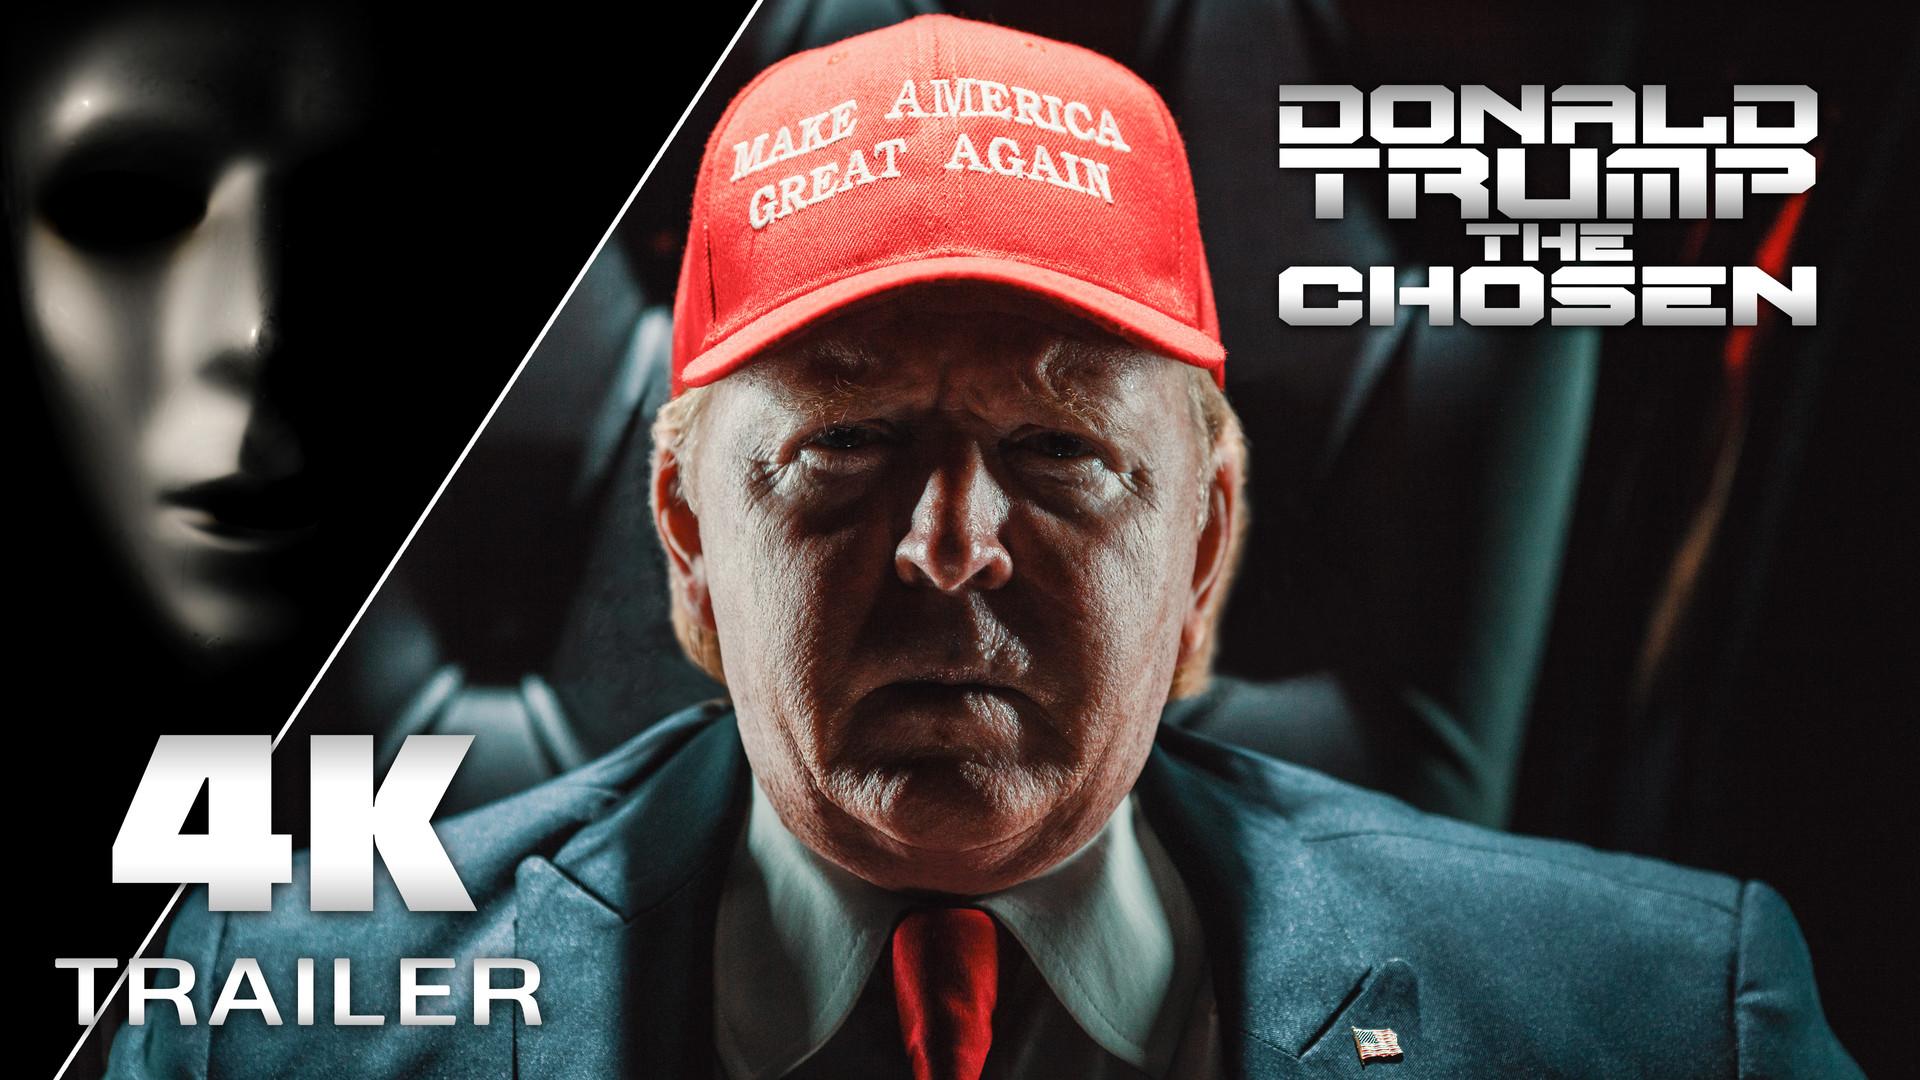 Trump Movie - YouTube Thumbnail 4K.jpg